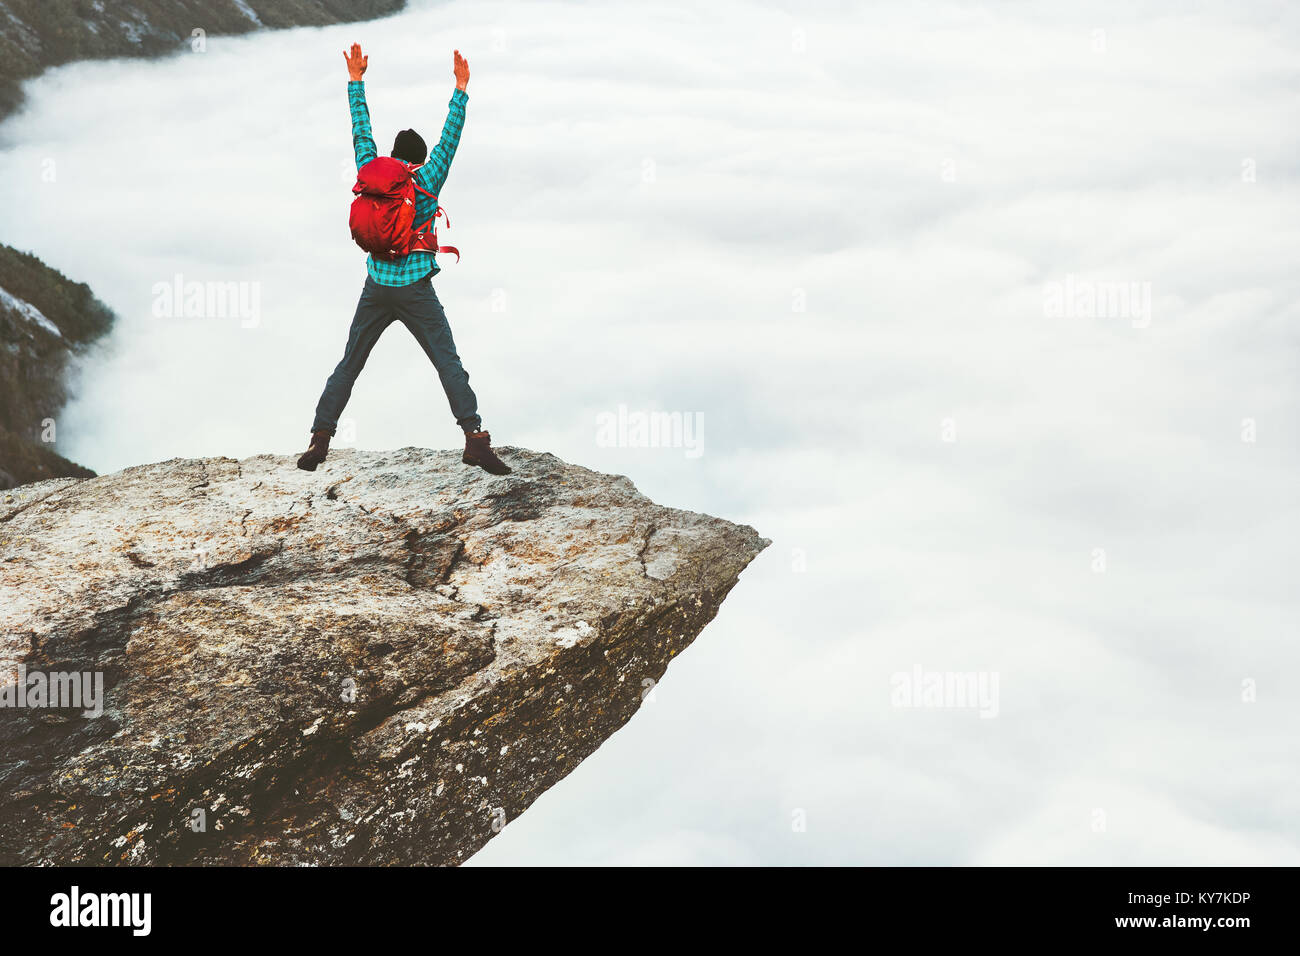 Man tourist jumping on Trolltunga rocky cliff mountains Travel Lifestyle wanderlust adventure concept active summer - Stock Image